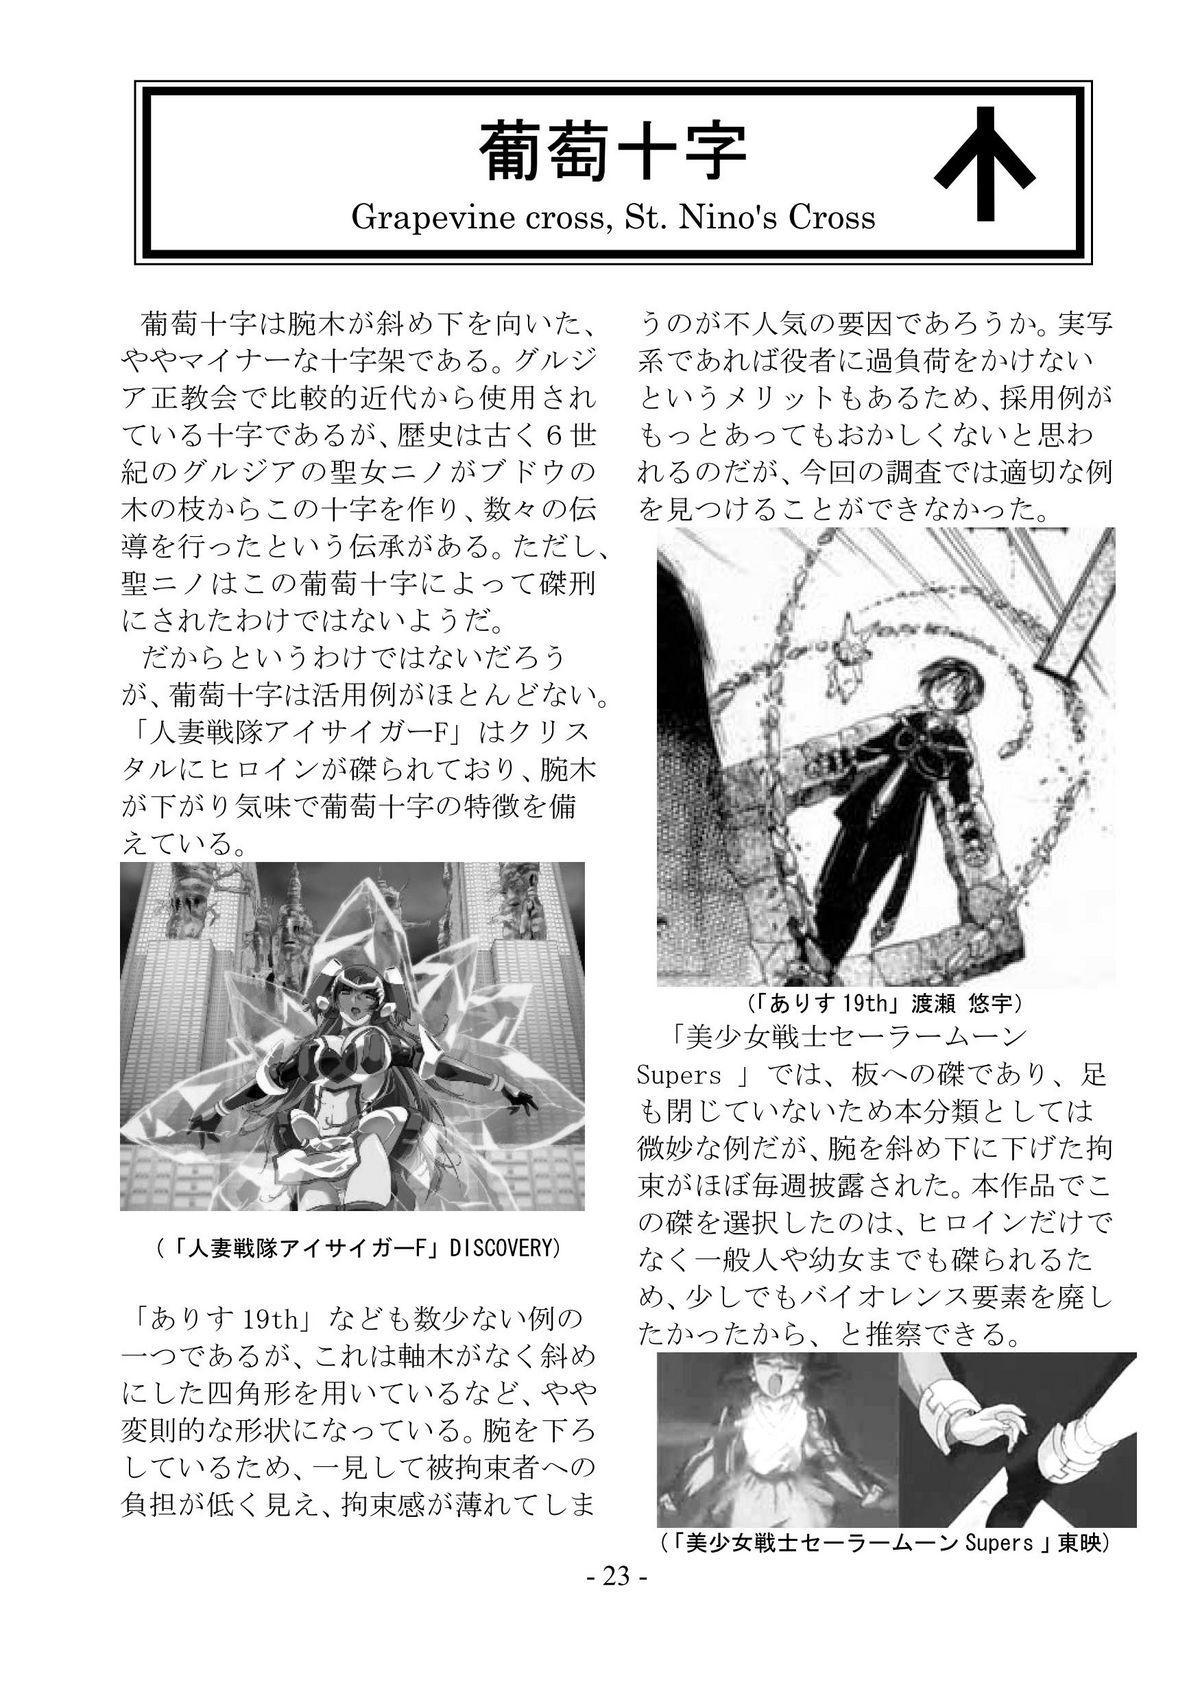 encyclopedia of crucifixion 23